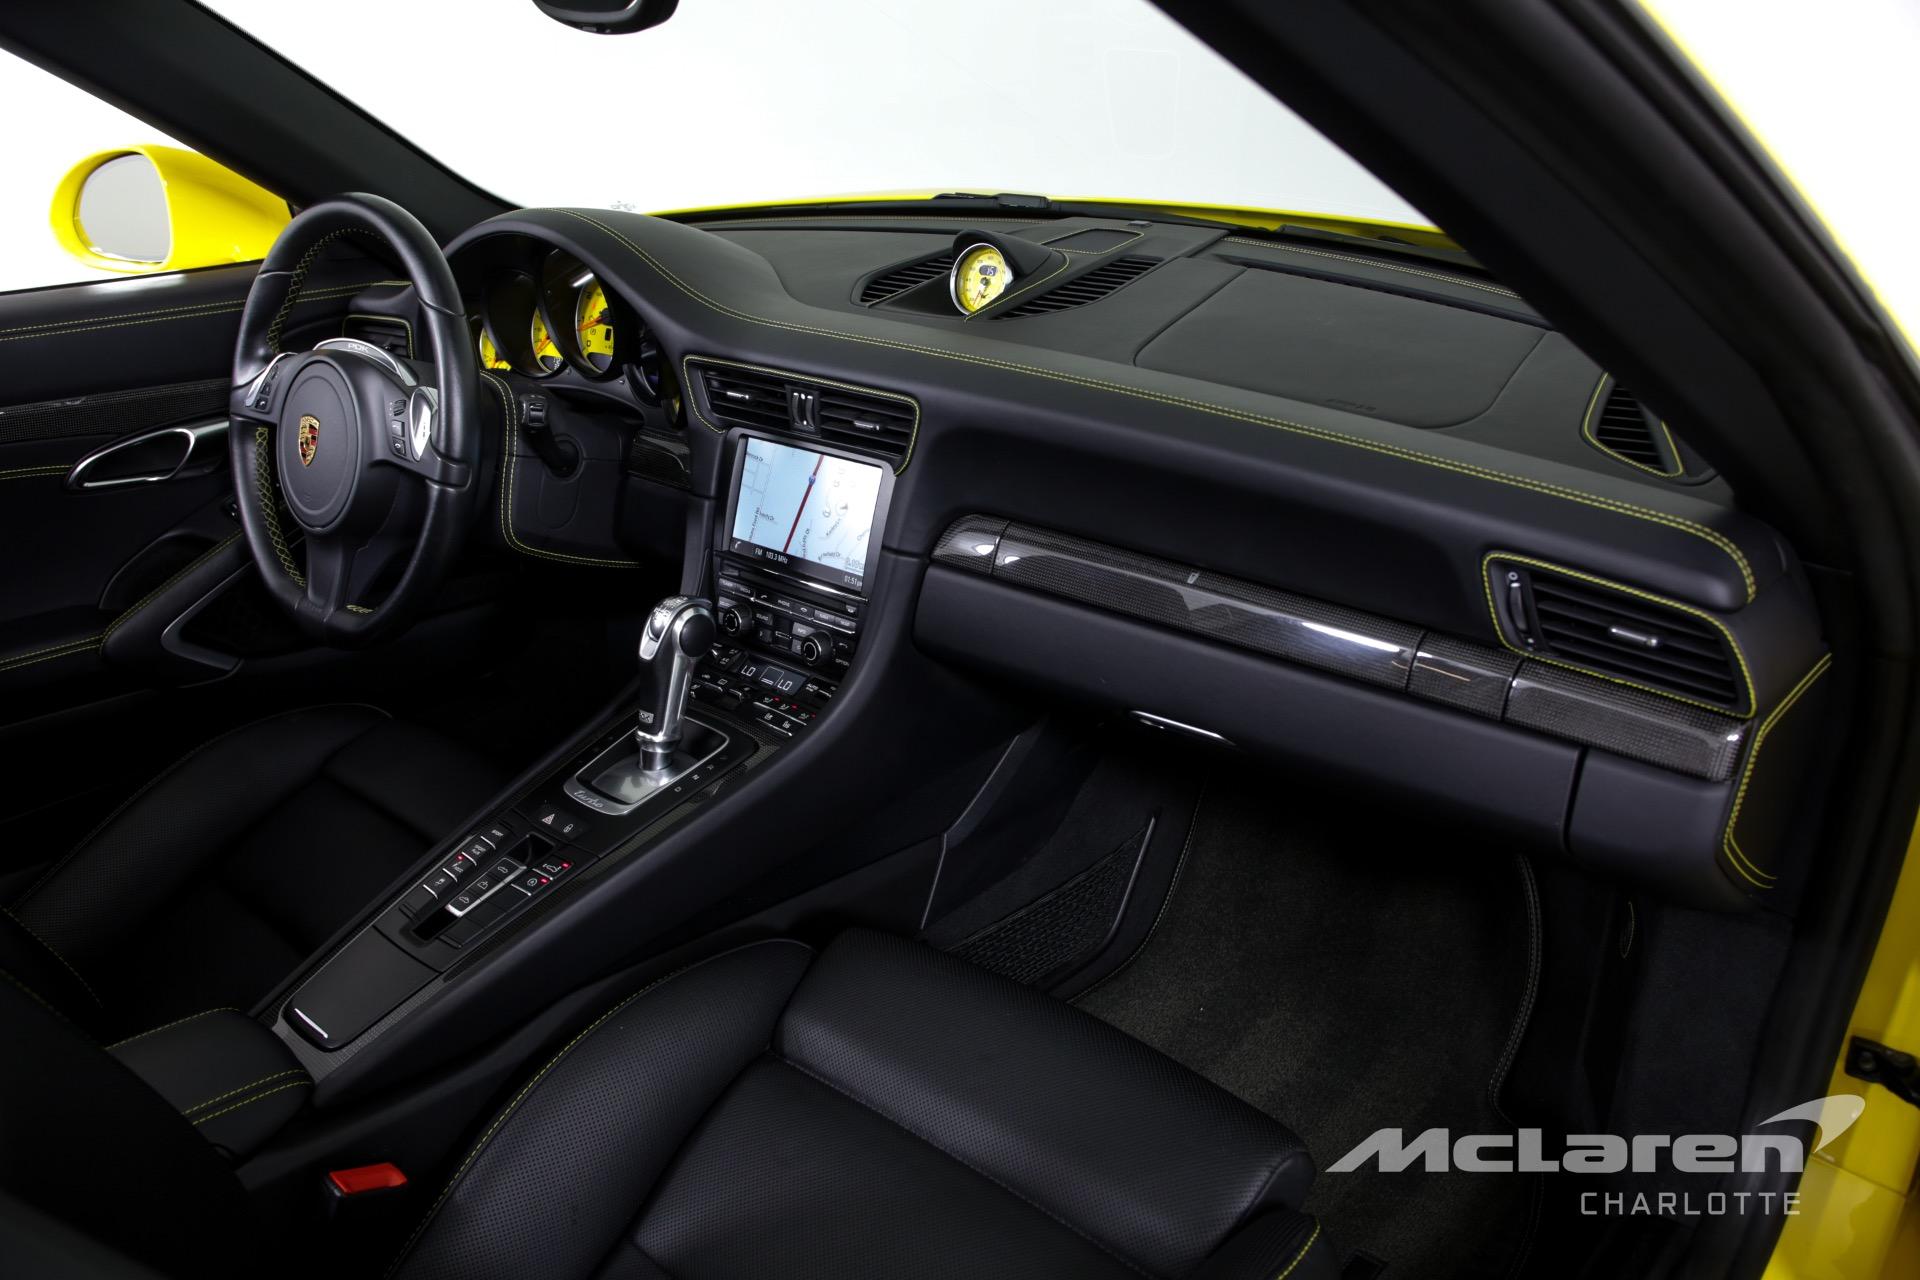 Used 2015 Porsche 911 Turbo S | Charlotte, NC